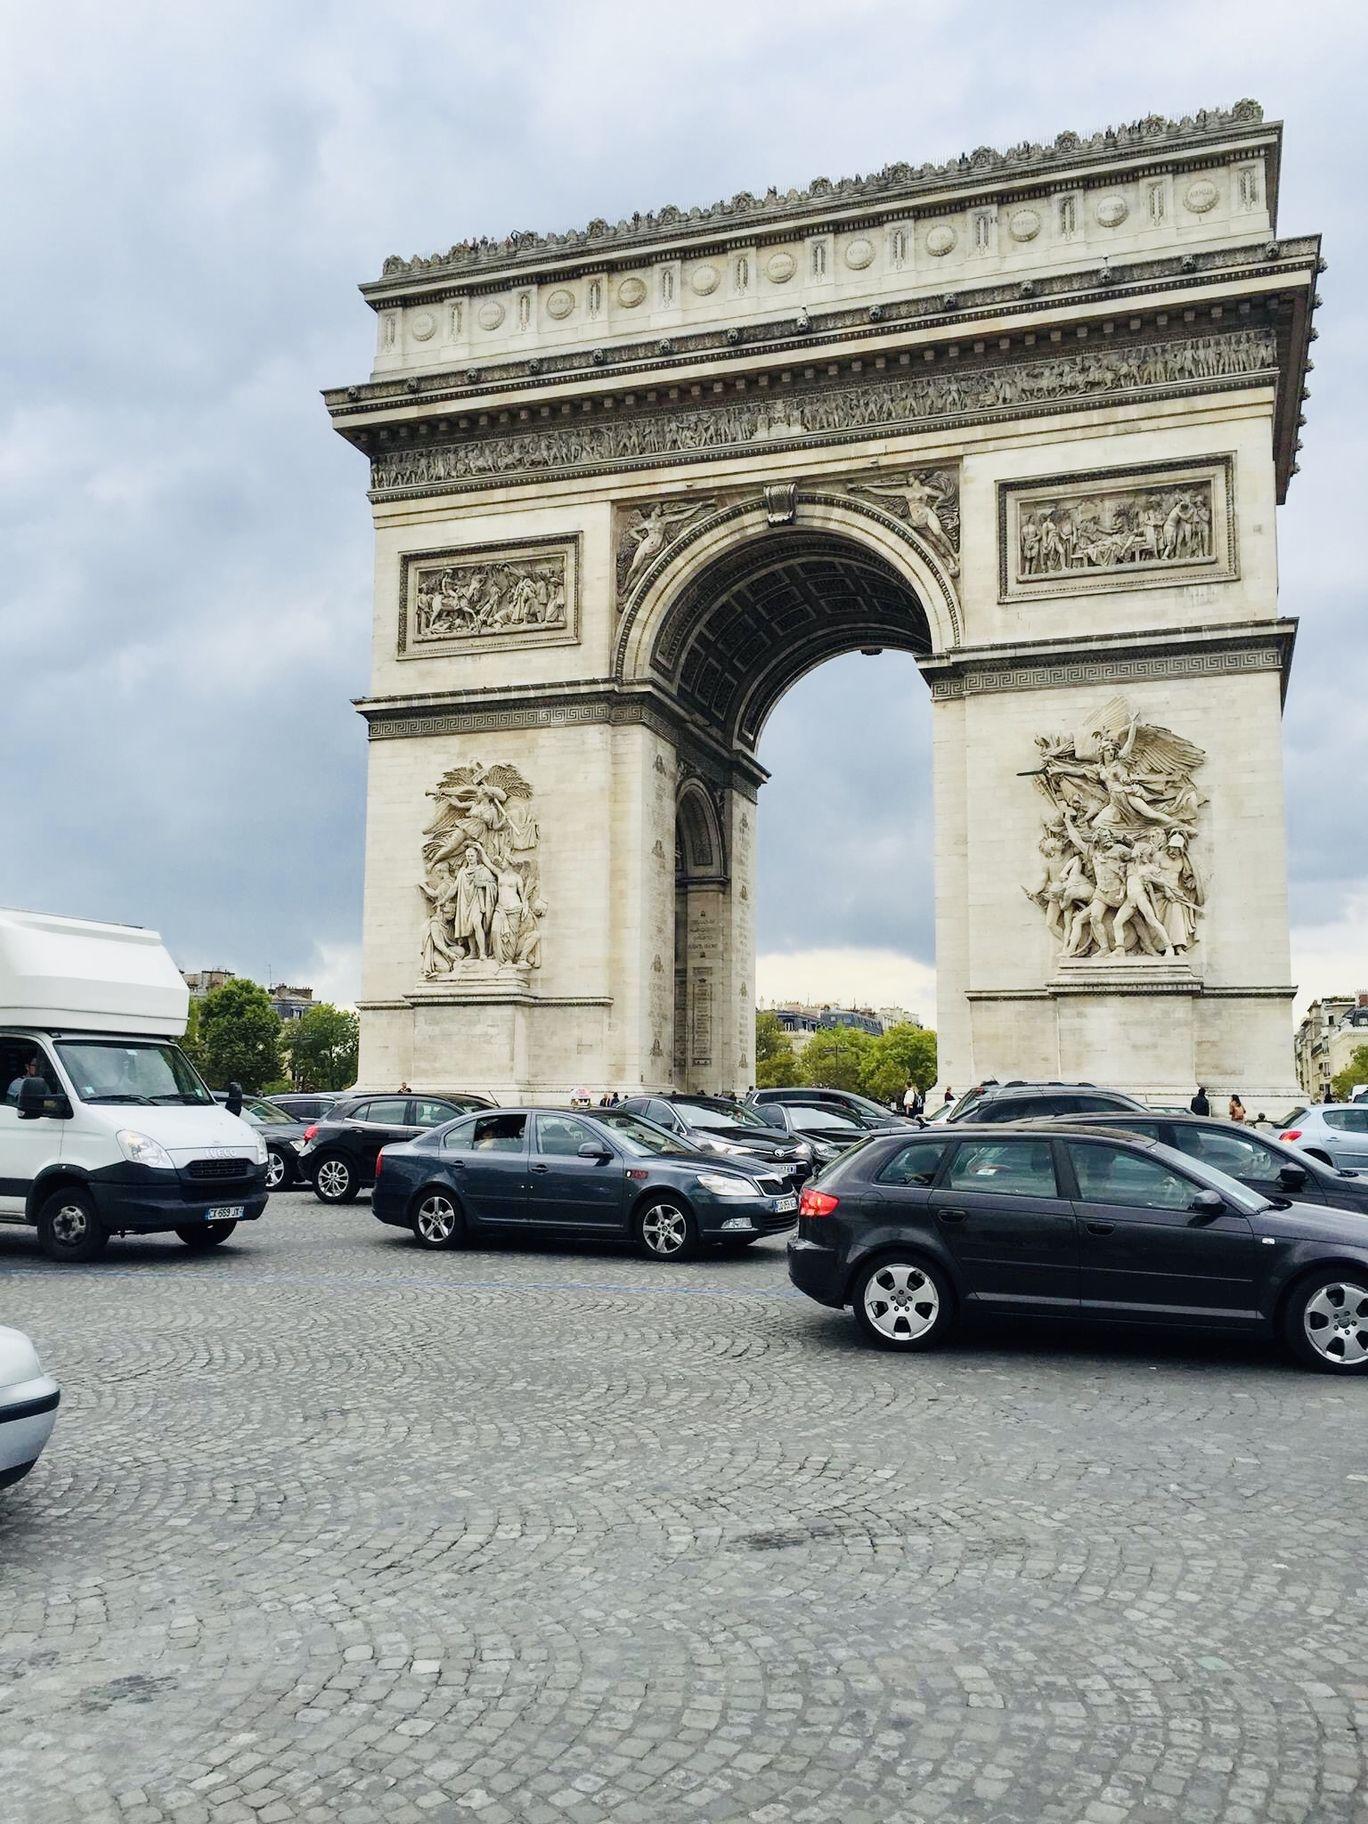 Photo of Arc de Triomphe By Rahul Agarwal